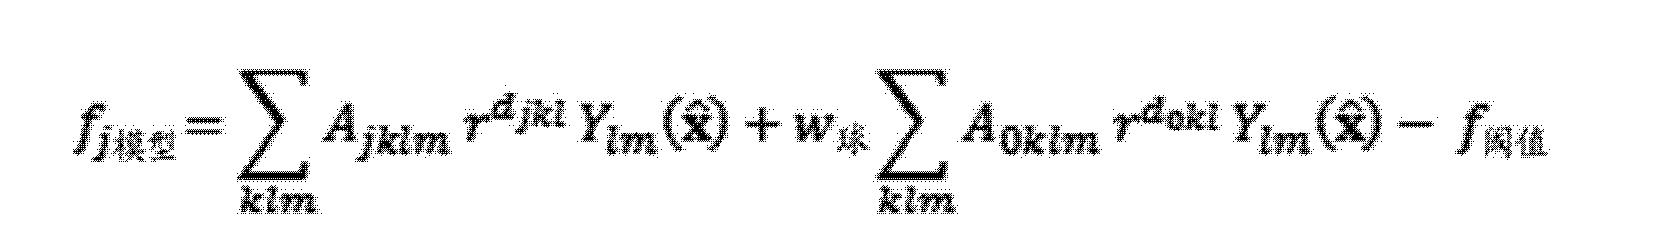 Figure CN104282036AD00413